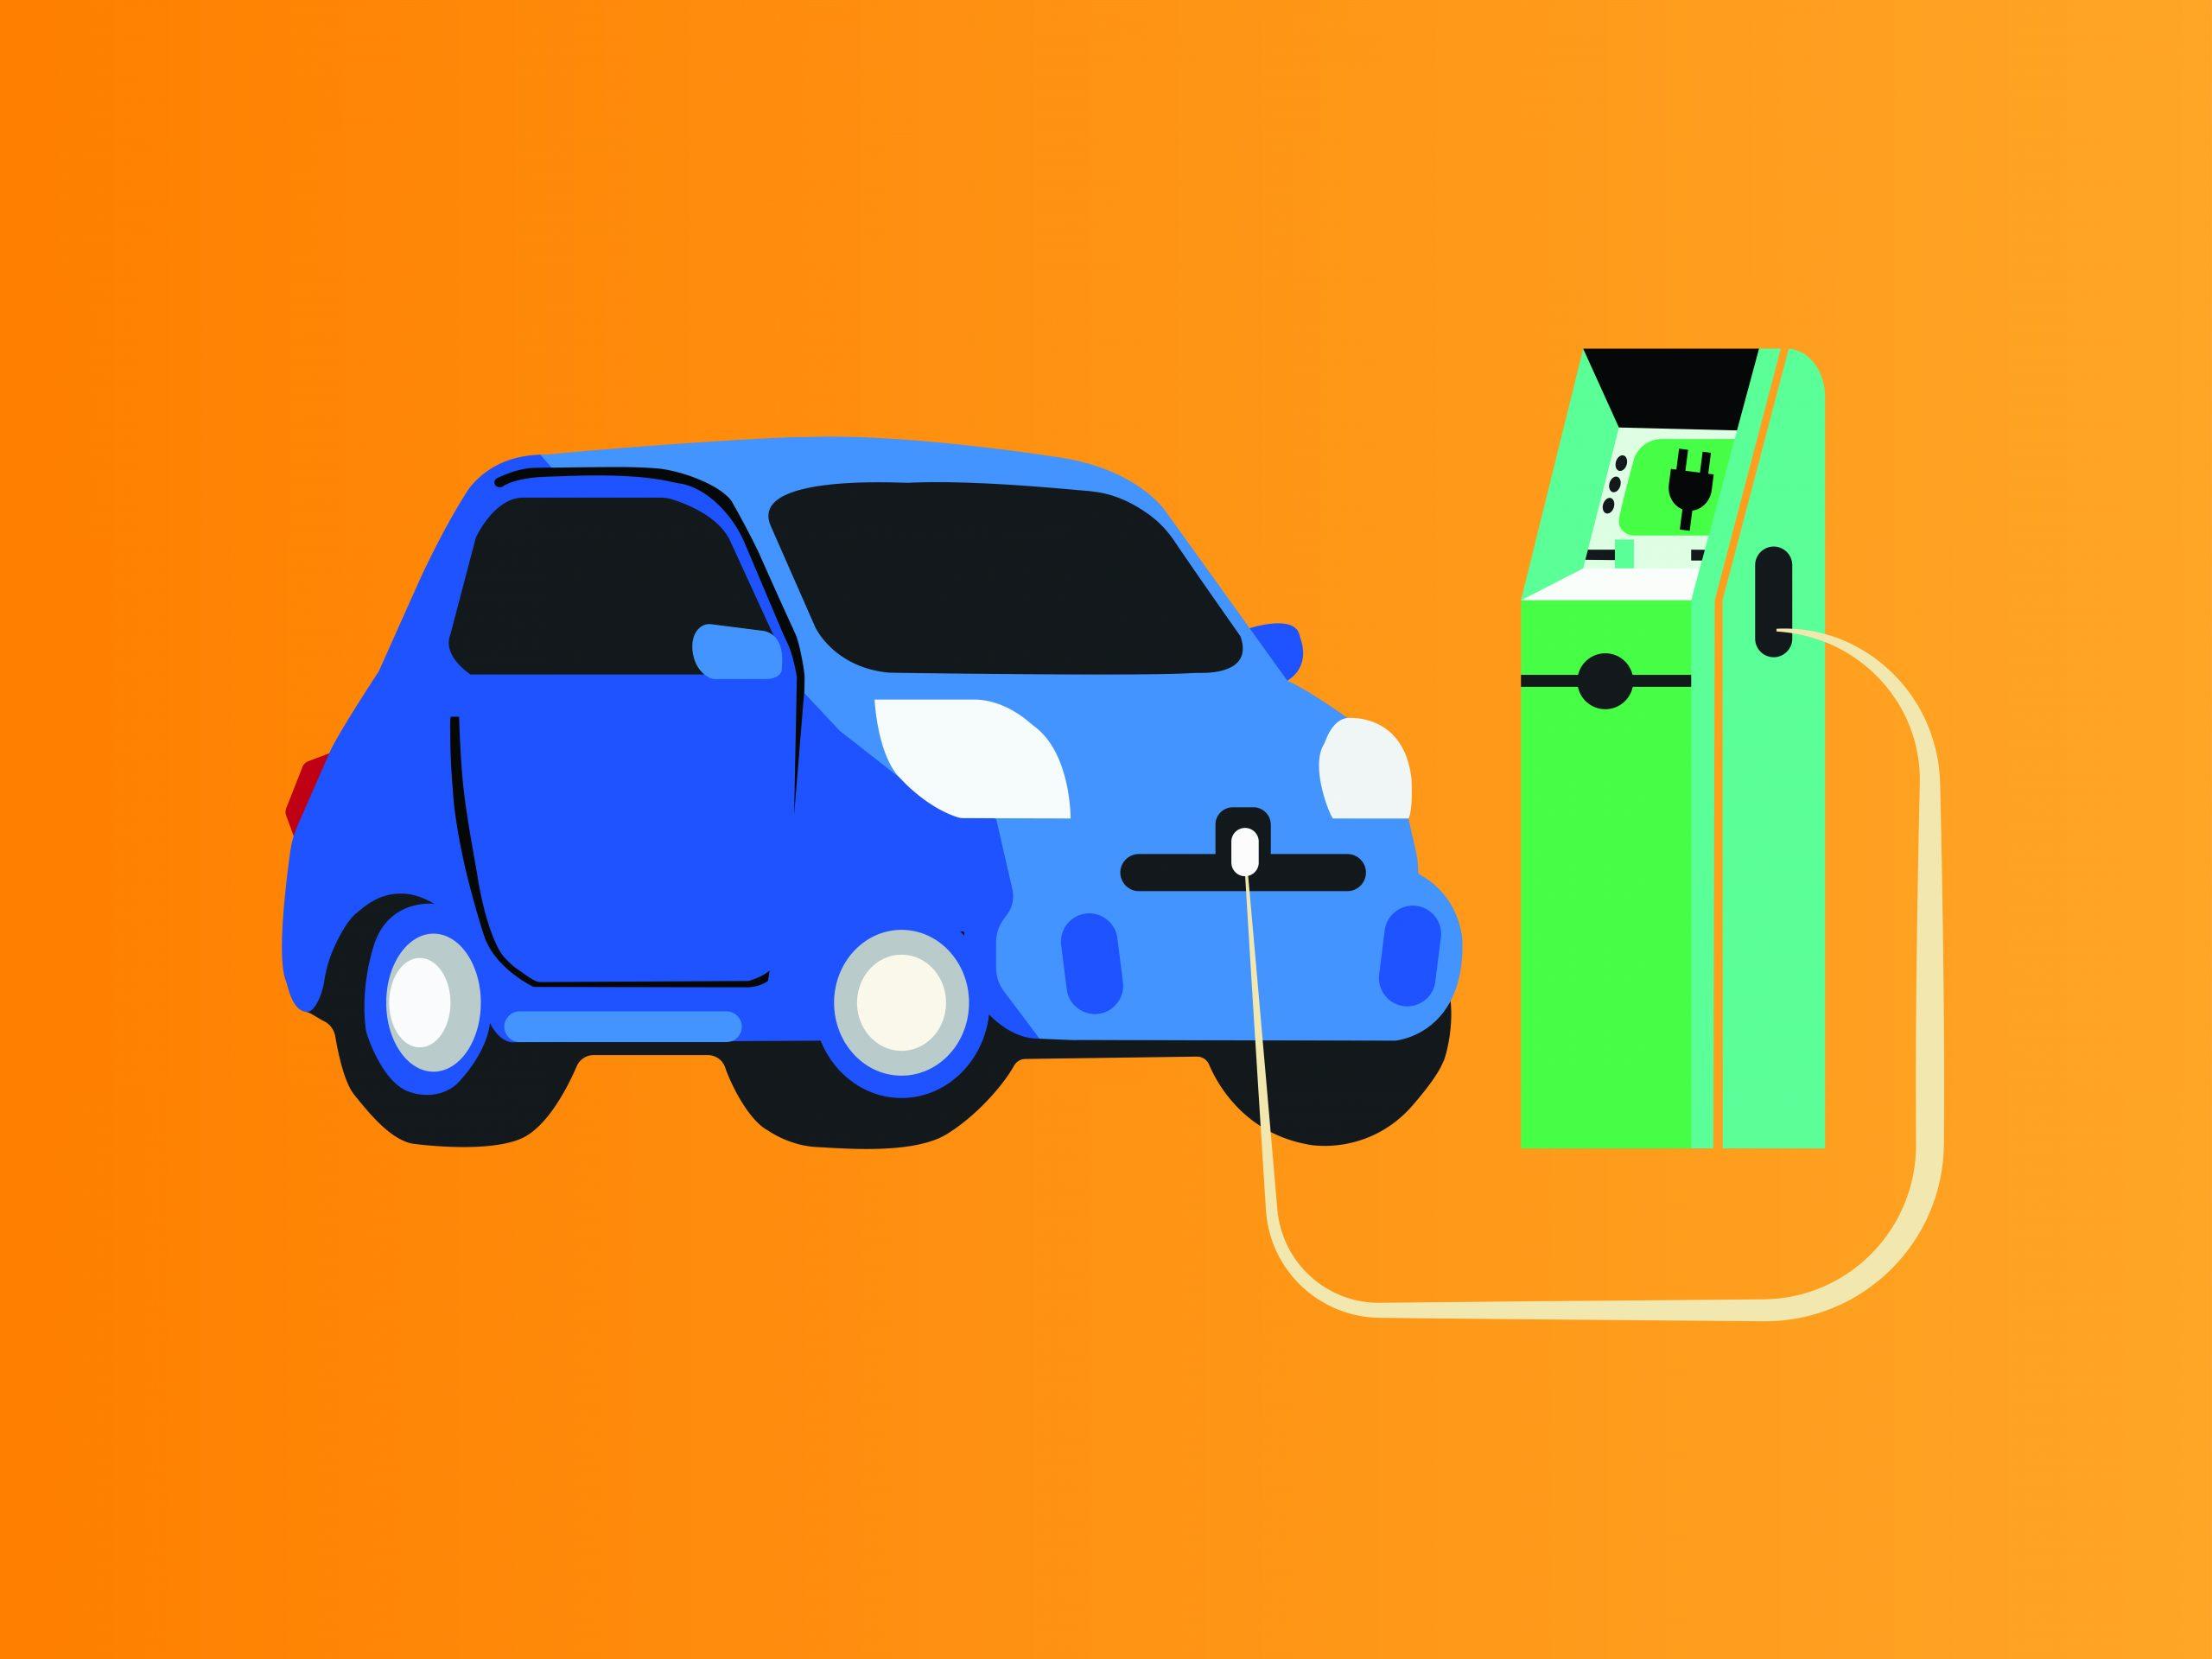 Electric-car charging